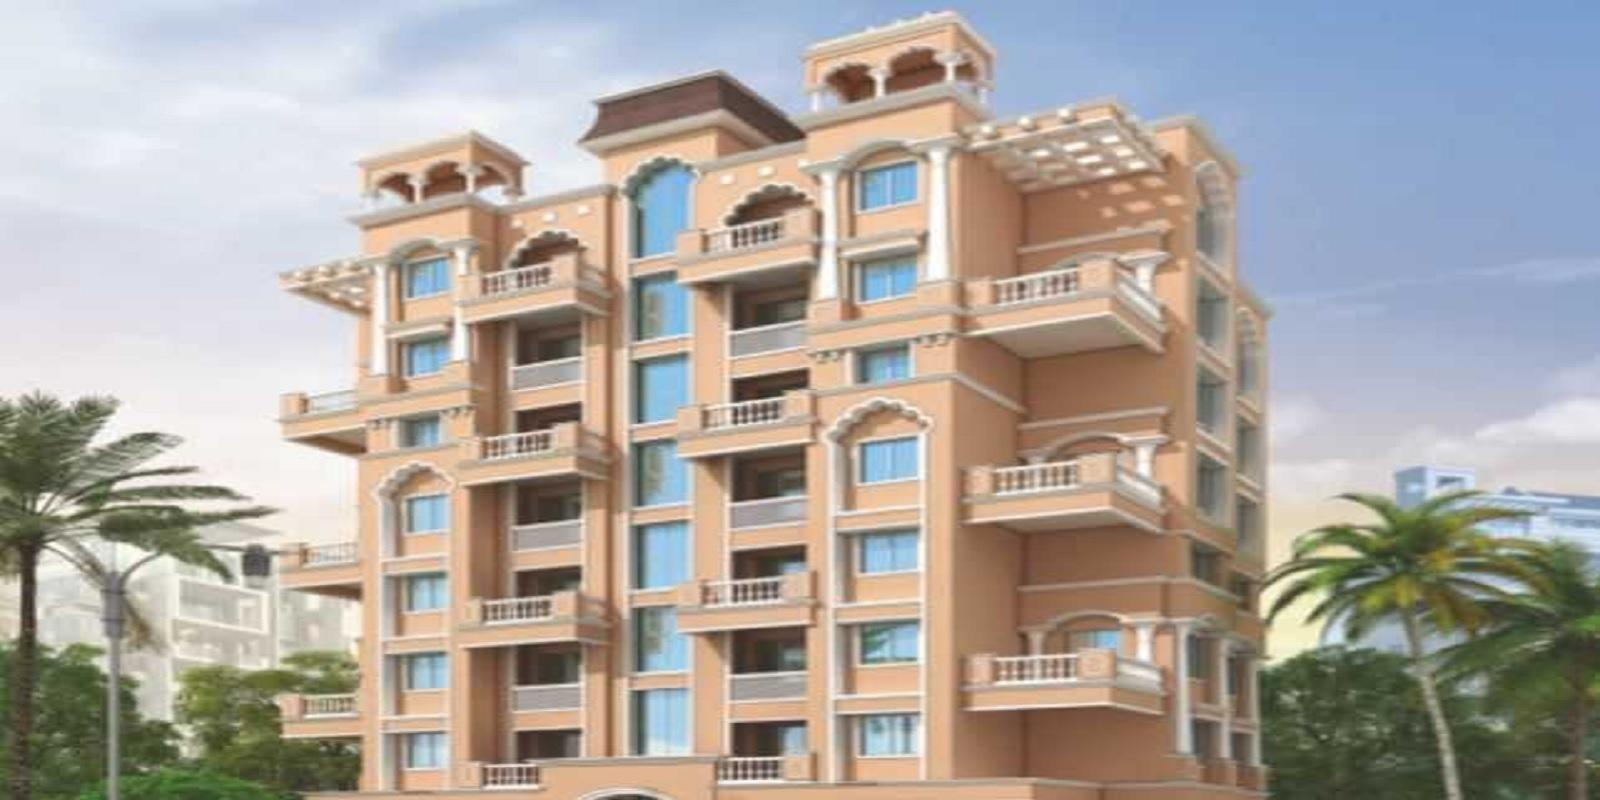 gbk vishwajeet dwellings project project large image1